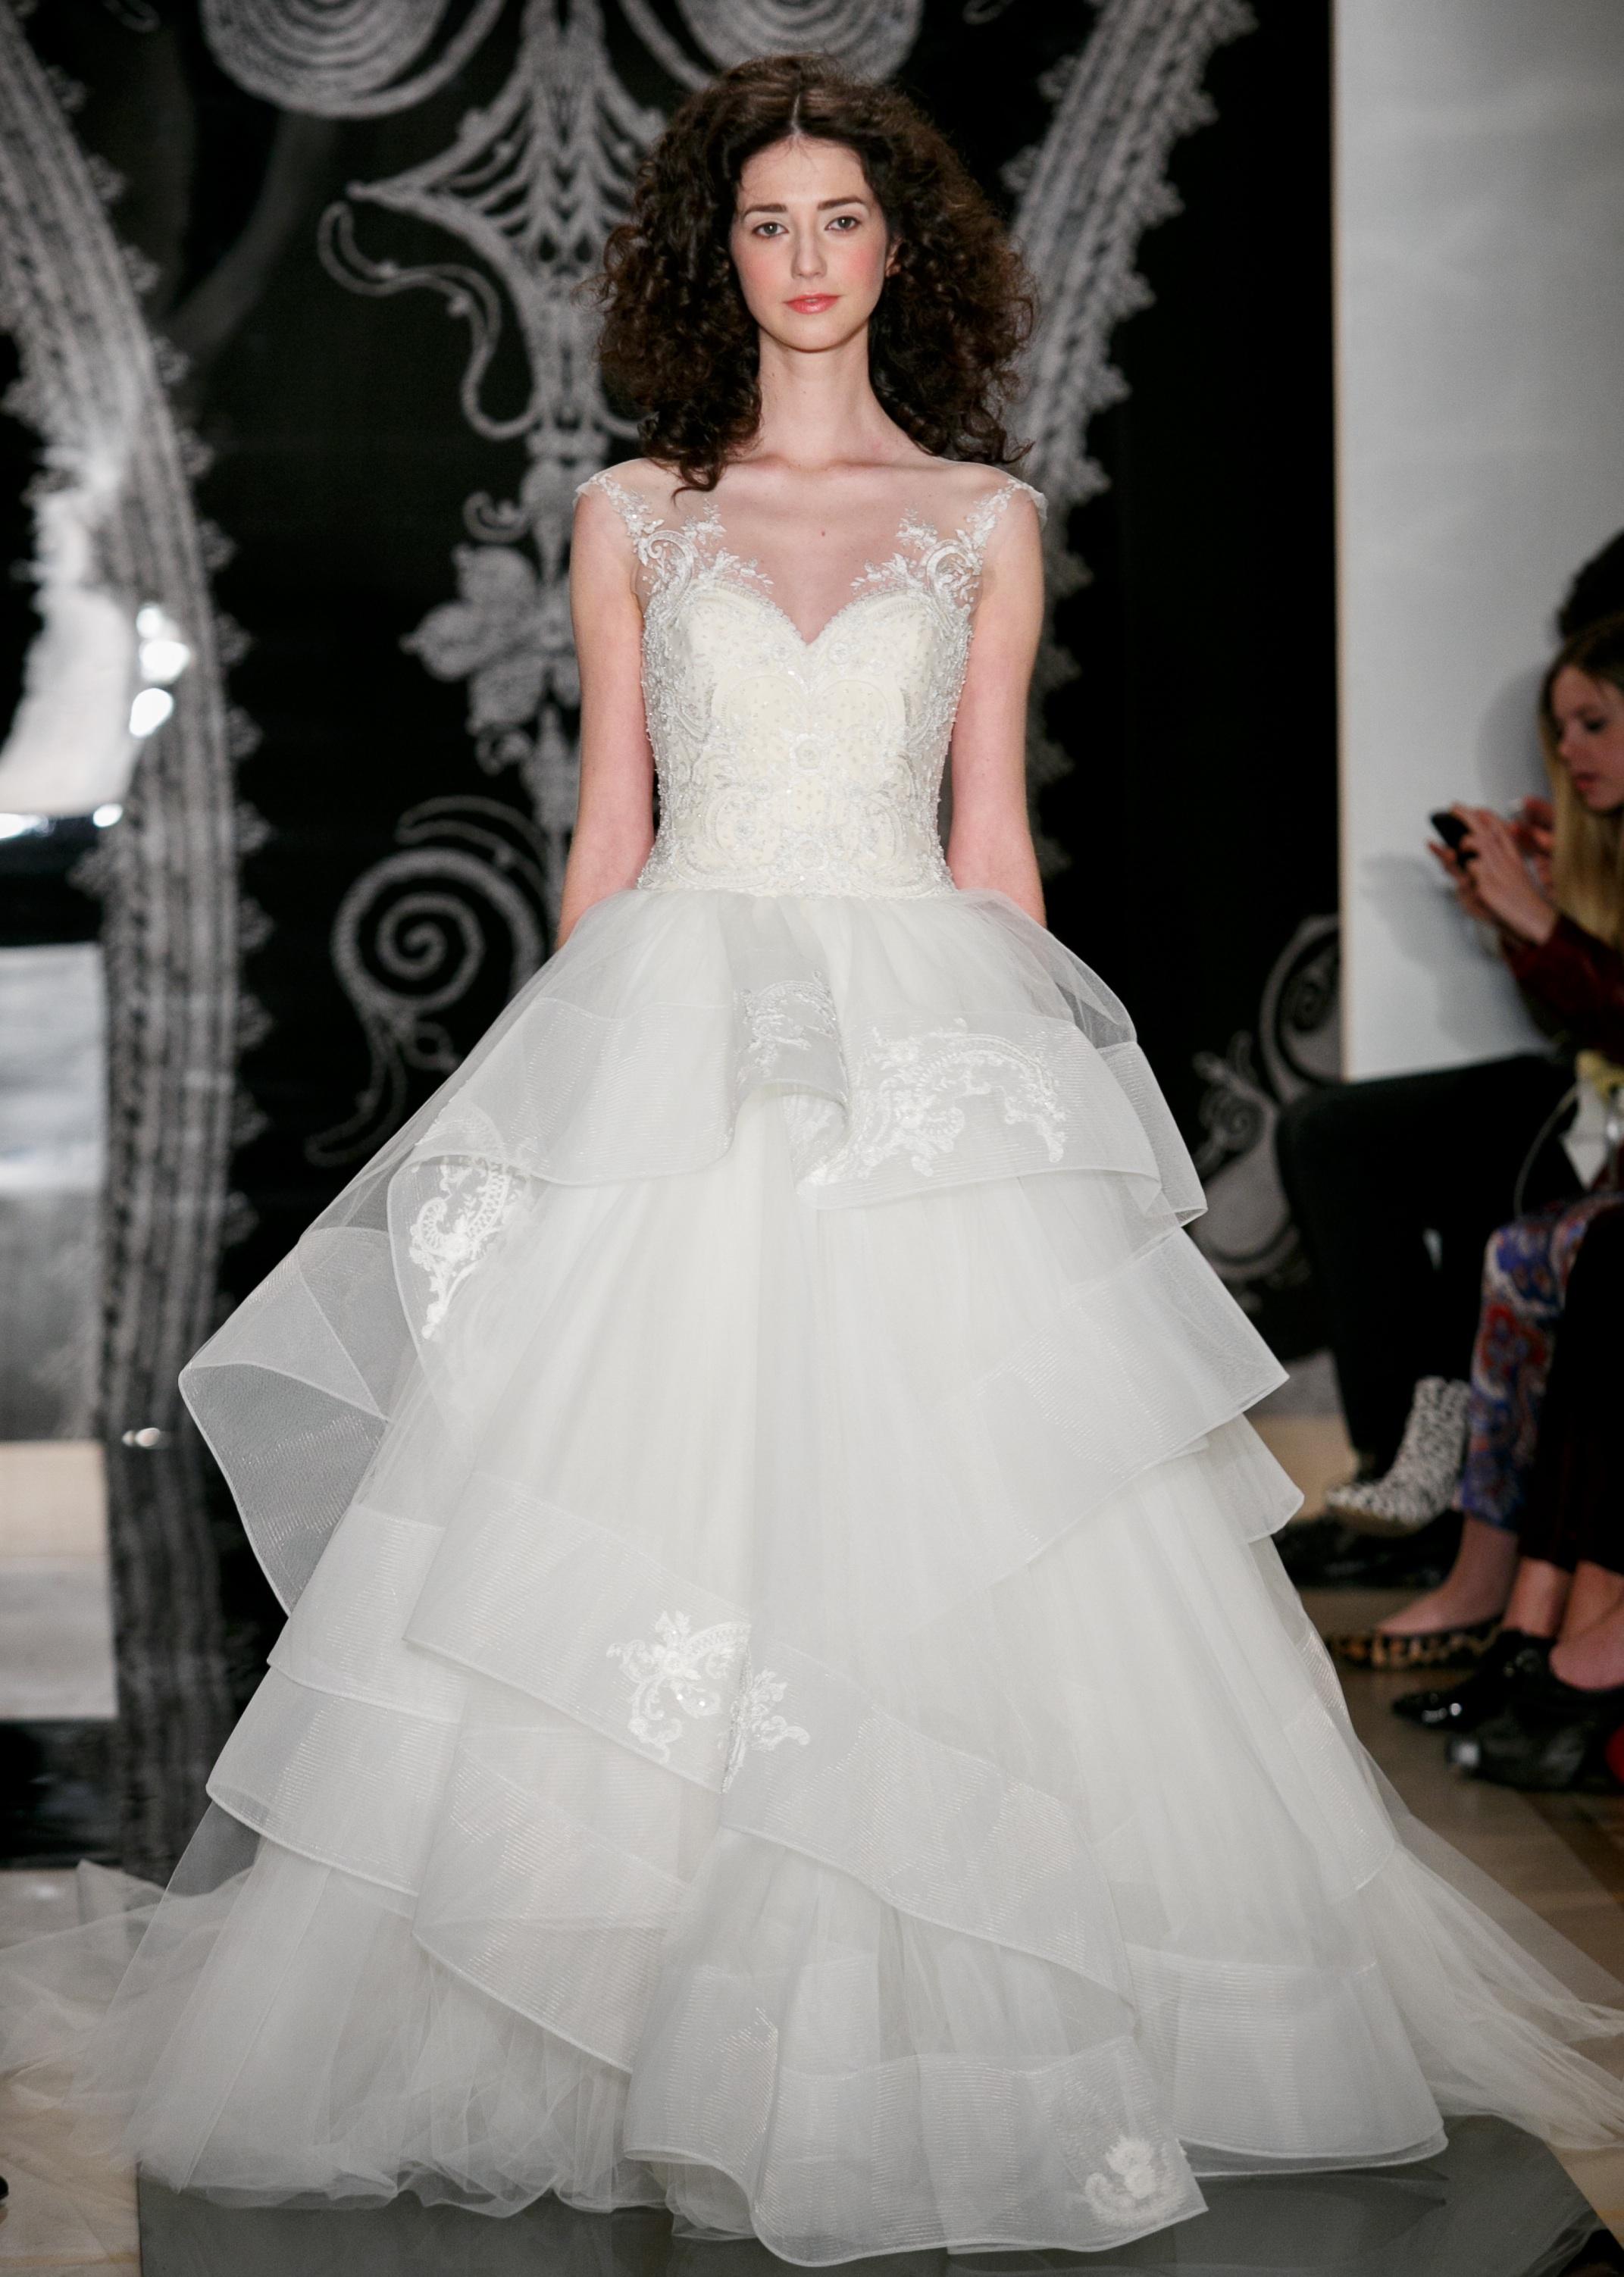 Reem Acra Wedding Gown 017 - Reem Acra Wedding Gown